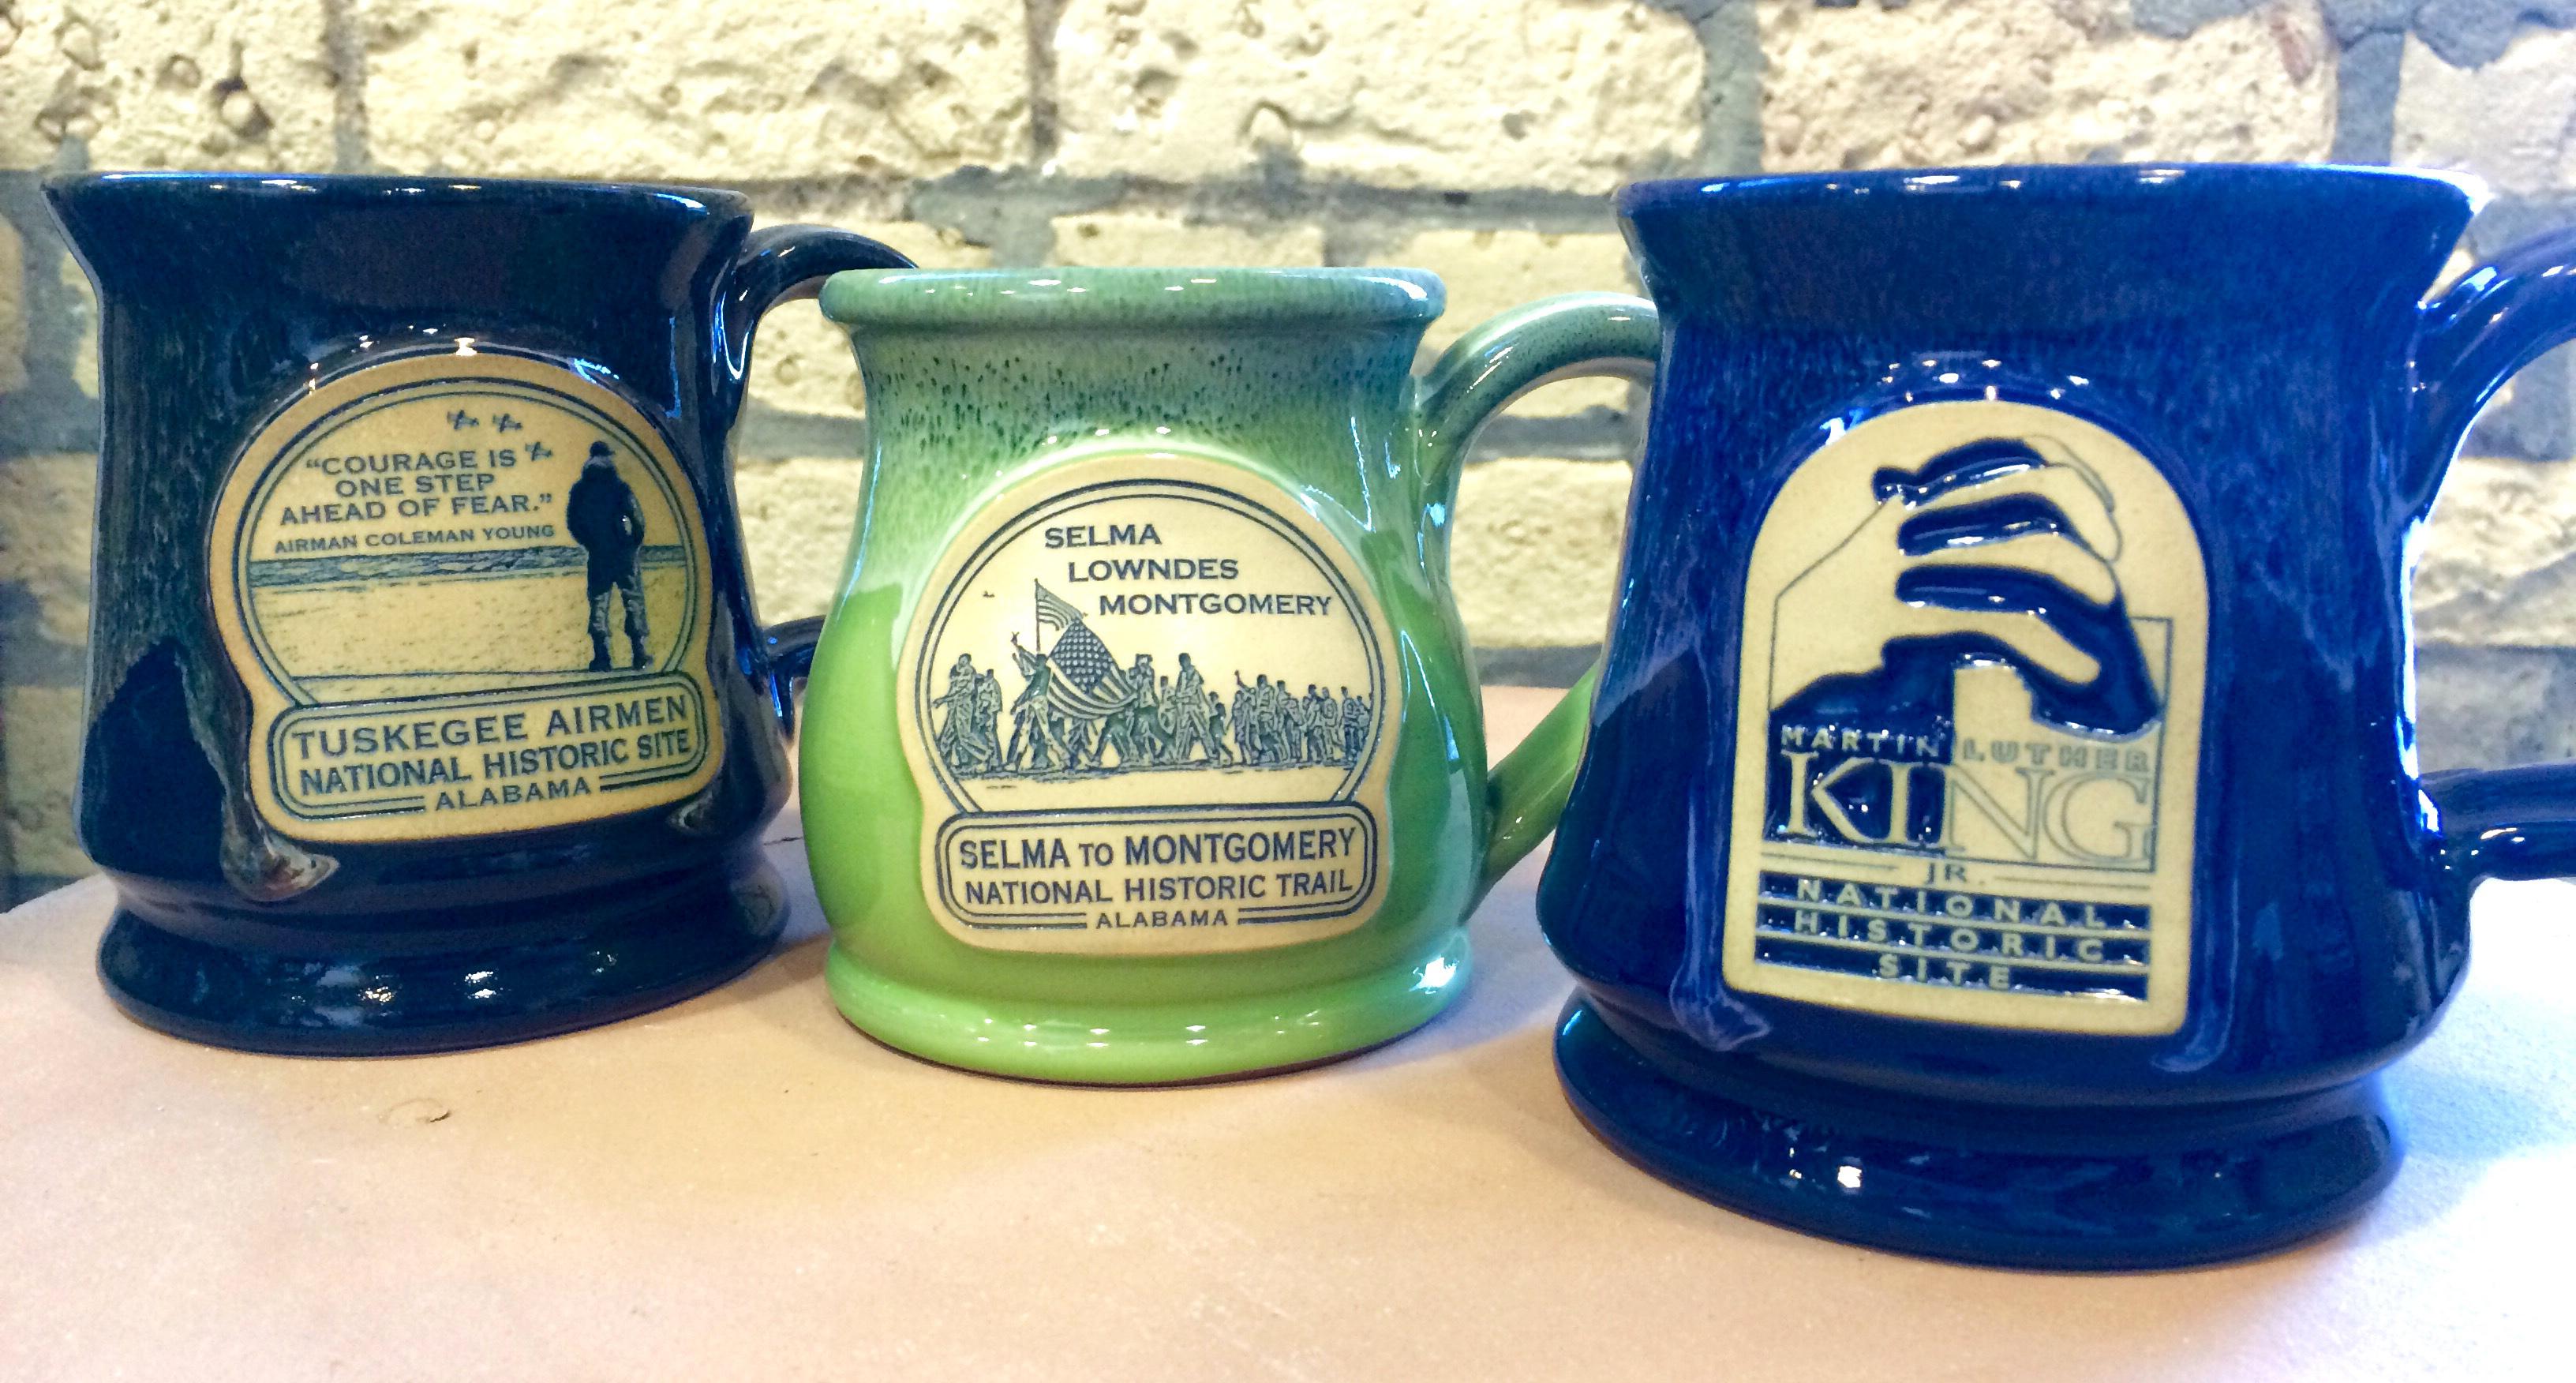 Slema-Montgomery-Martin-Luther-King-Tuskegee-Airmen-handmade-mug